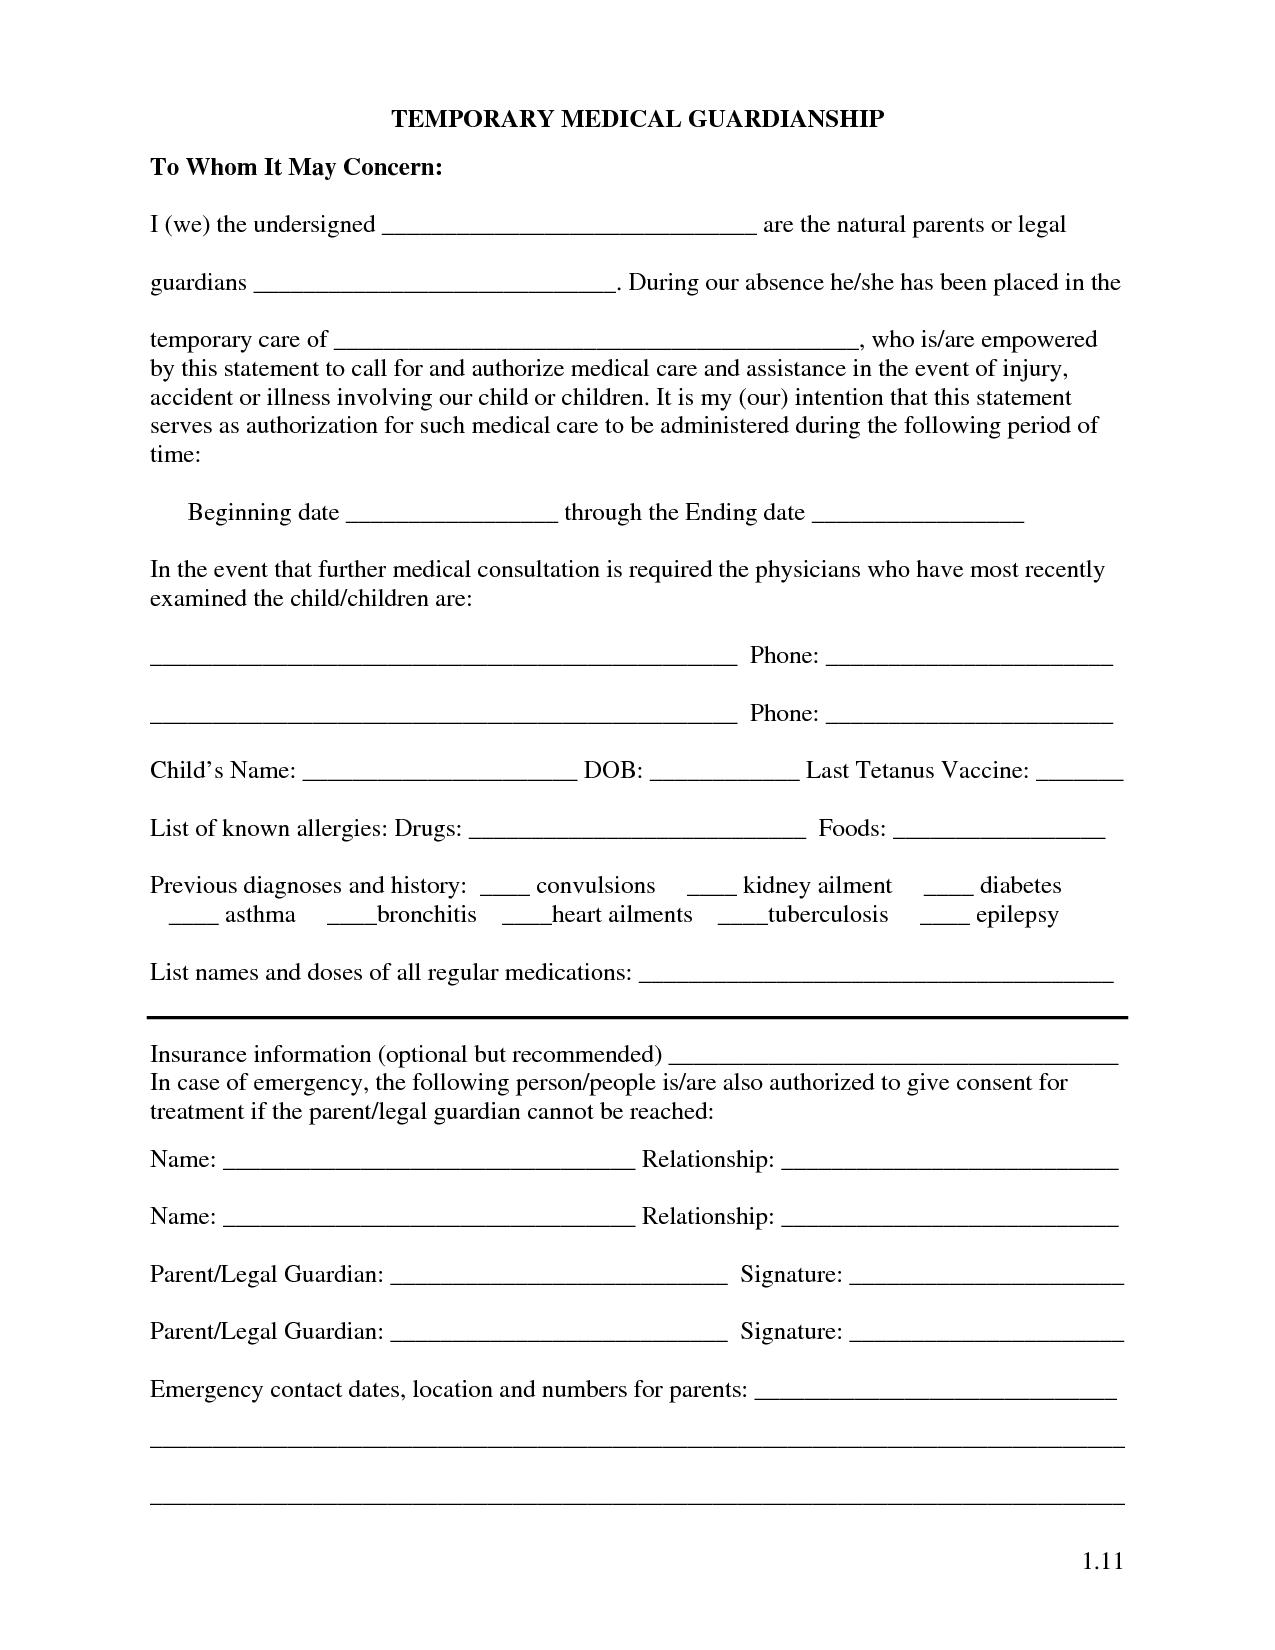 Free Printable Temporary Guardianship Forms   Forms - Free Printable Guardianship Forms